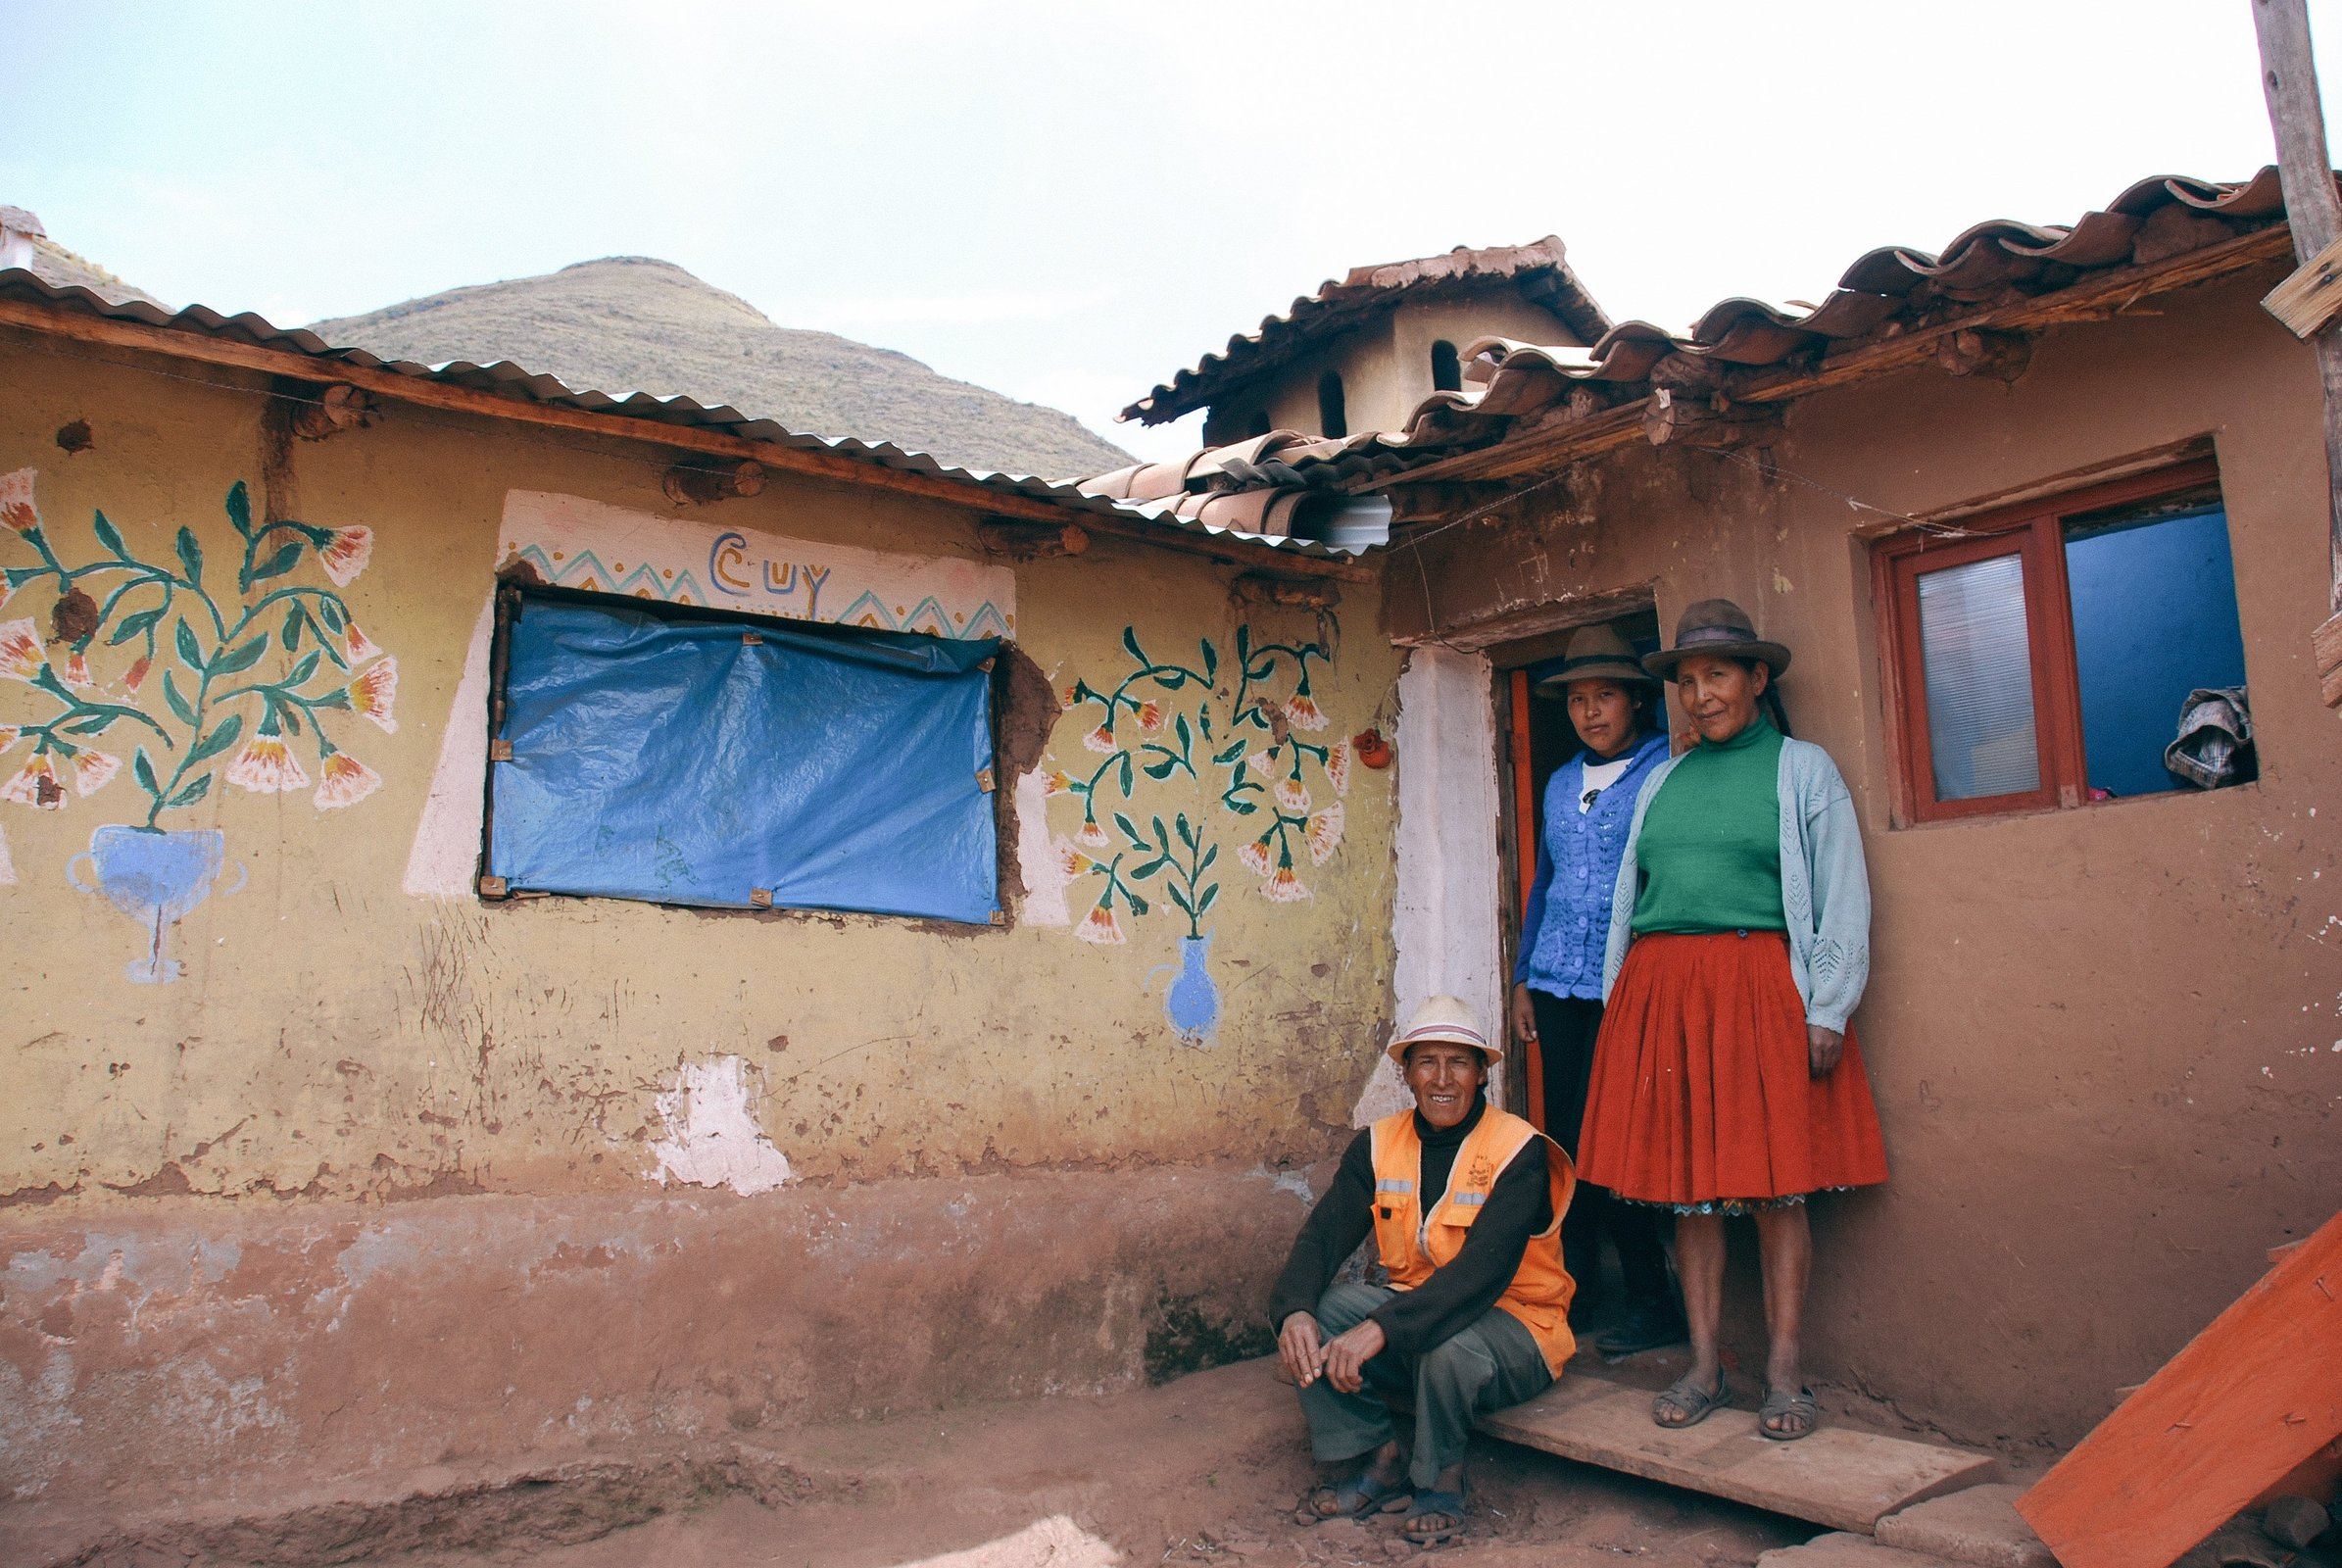 Orgullo quechua